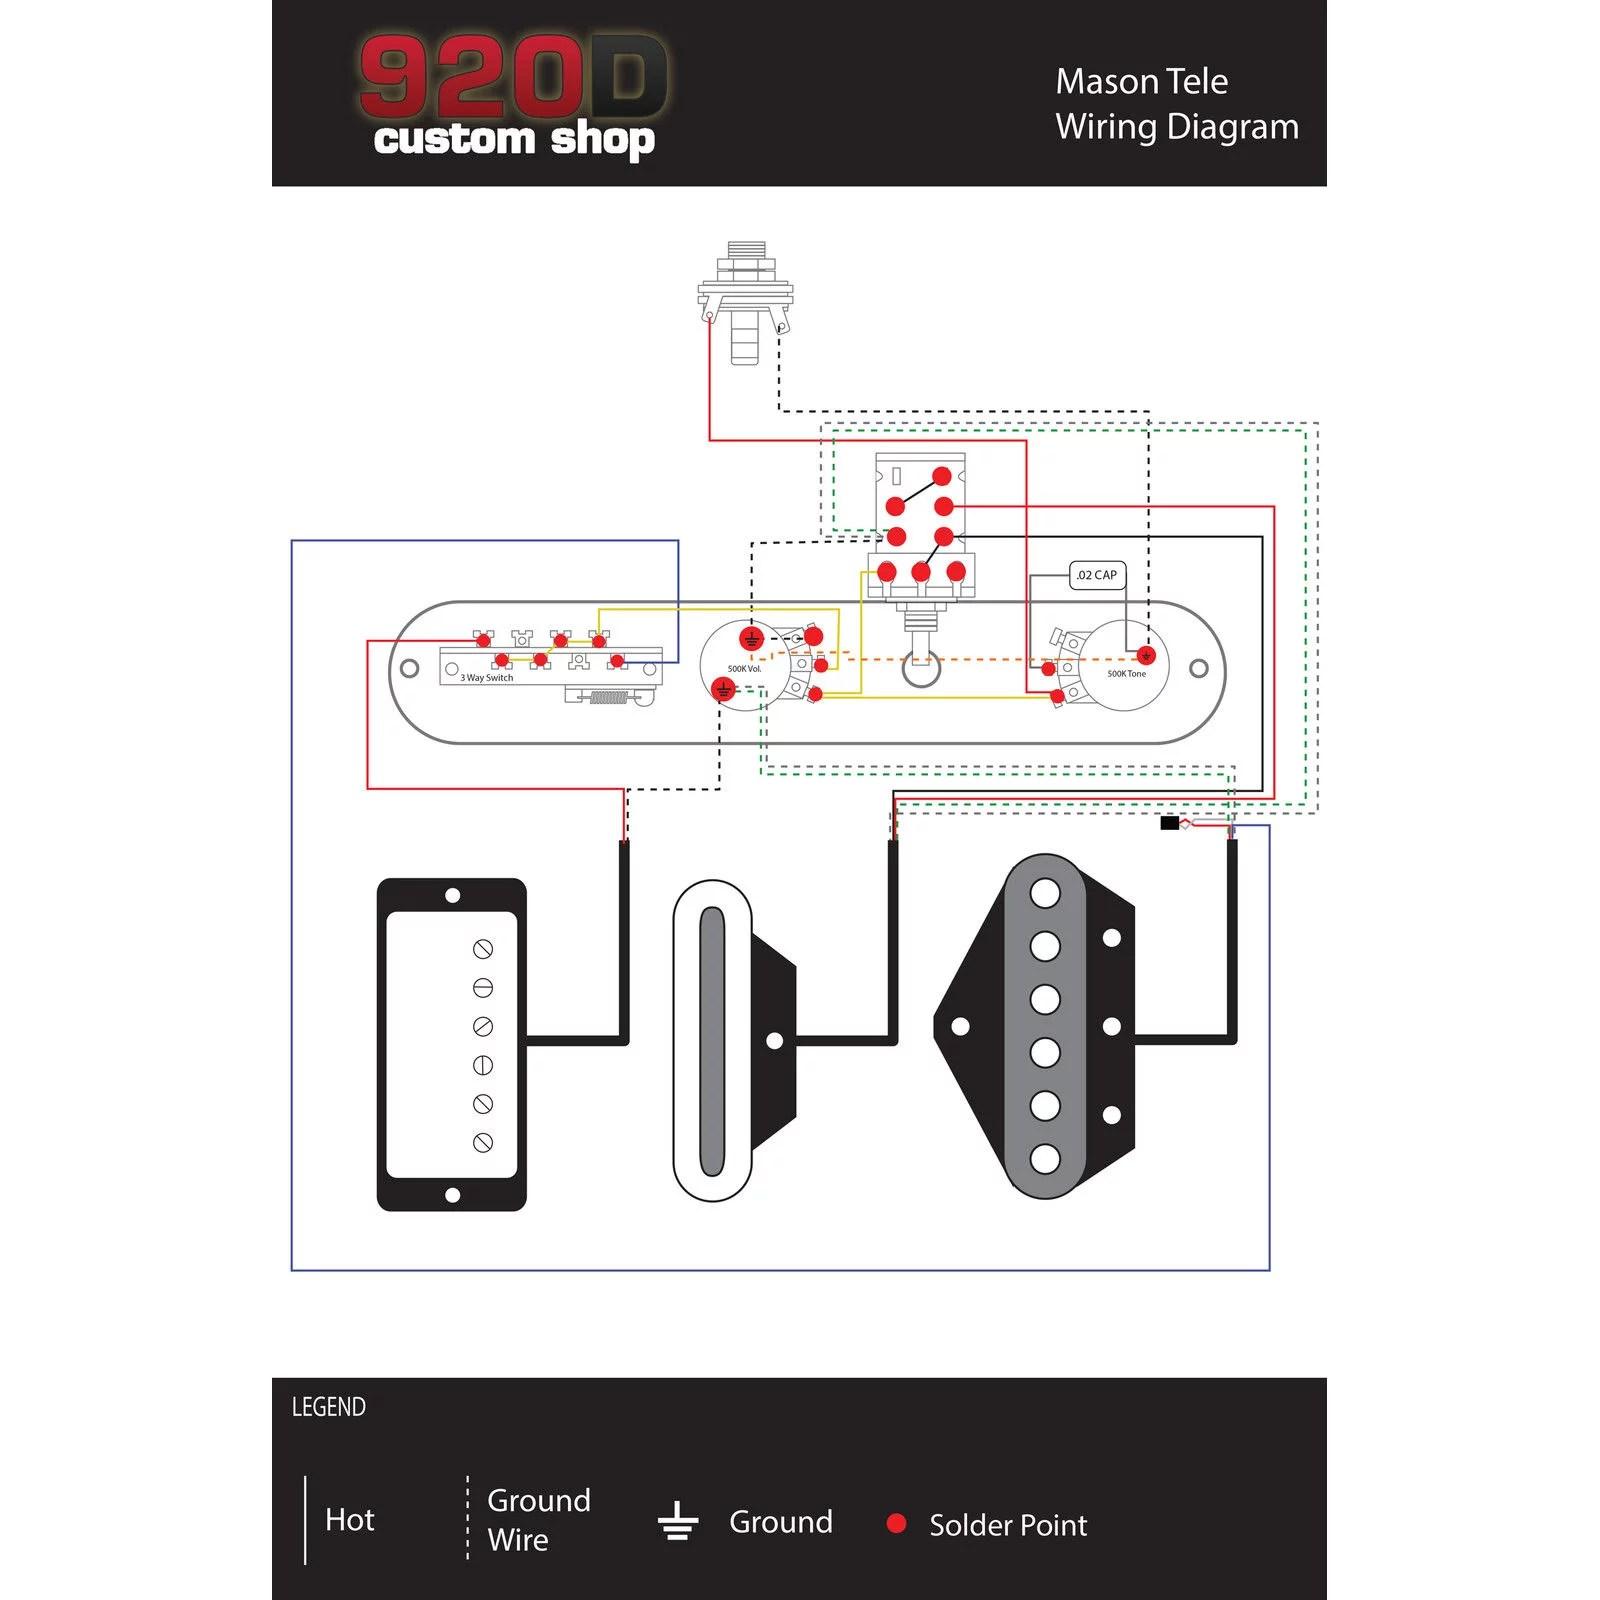 medium resolution of 920d fender telecaster tele brent mason style 3 w control plate fender wiring diagrams 920d fender